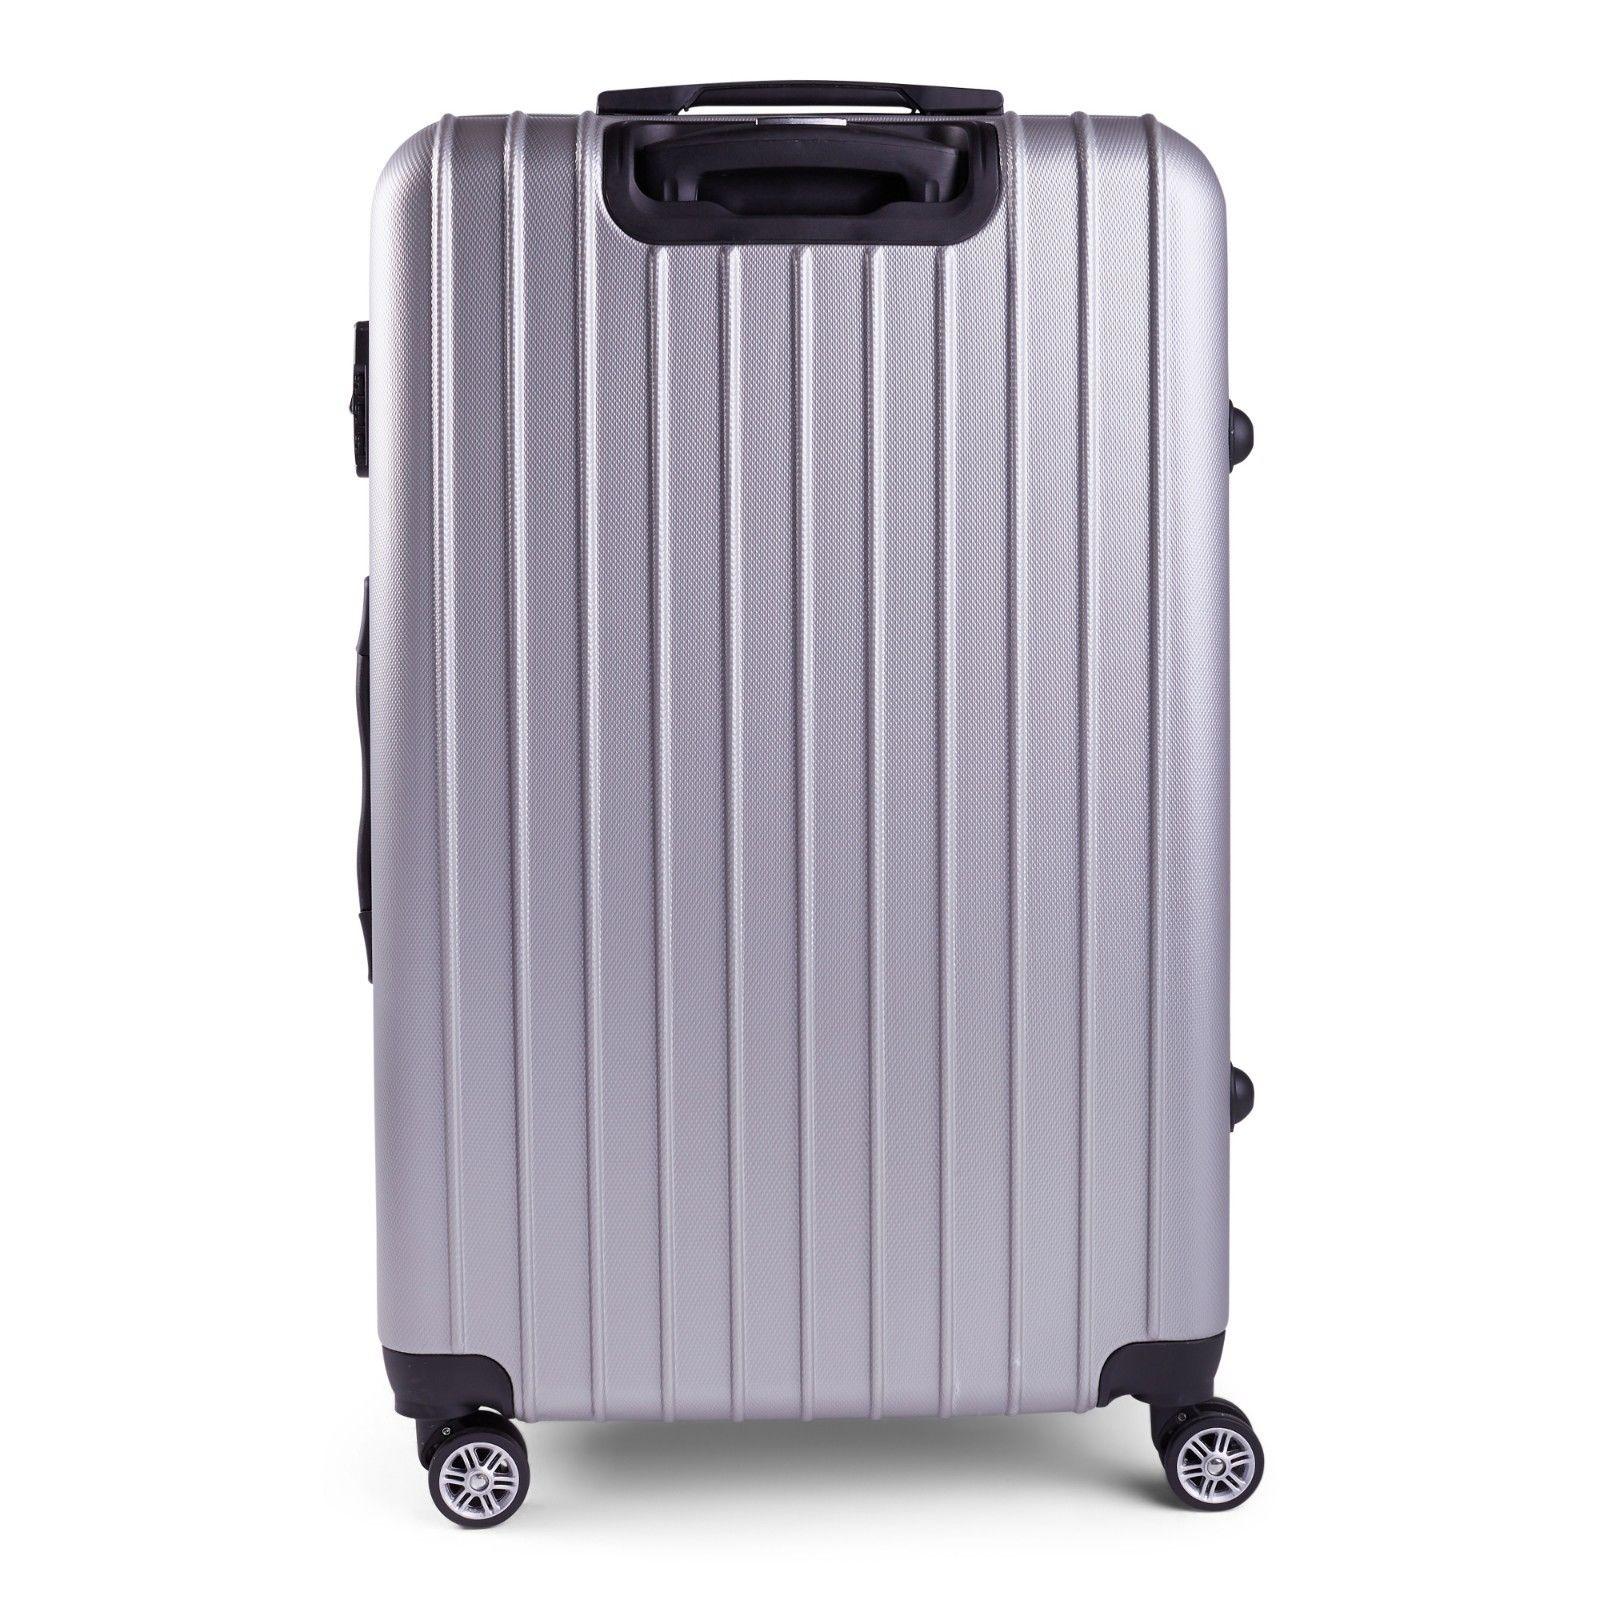 Milano-Premium-3pc-ABS-Luggage-Suitcase-Luxury-Hard-Case-Shockproof-Travel-Set thumbnail 31